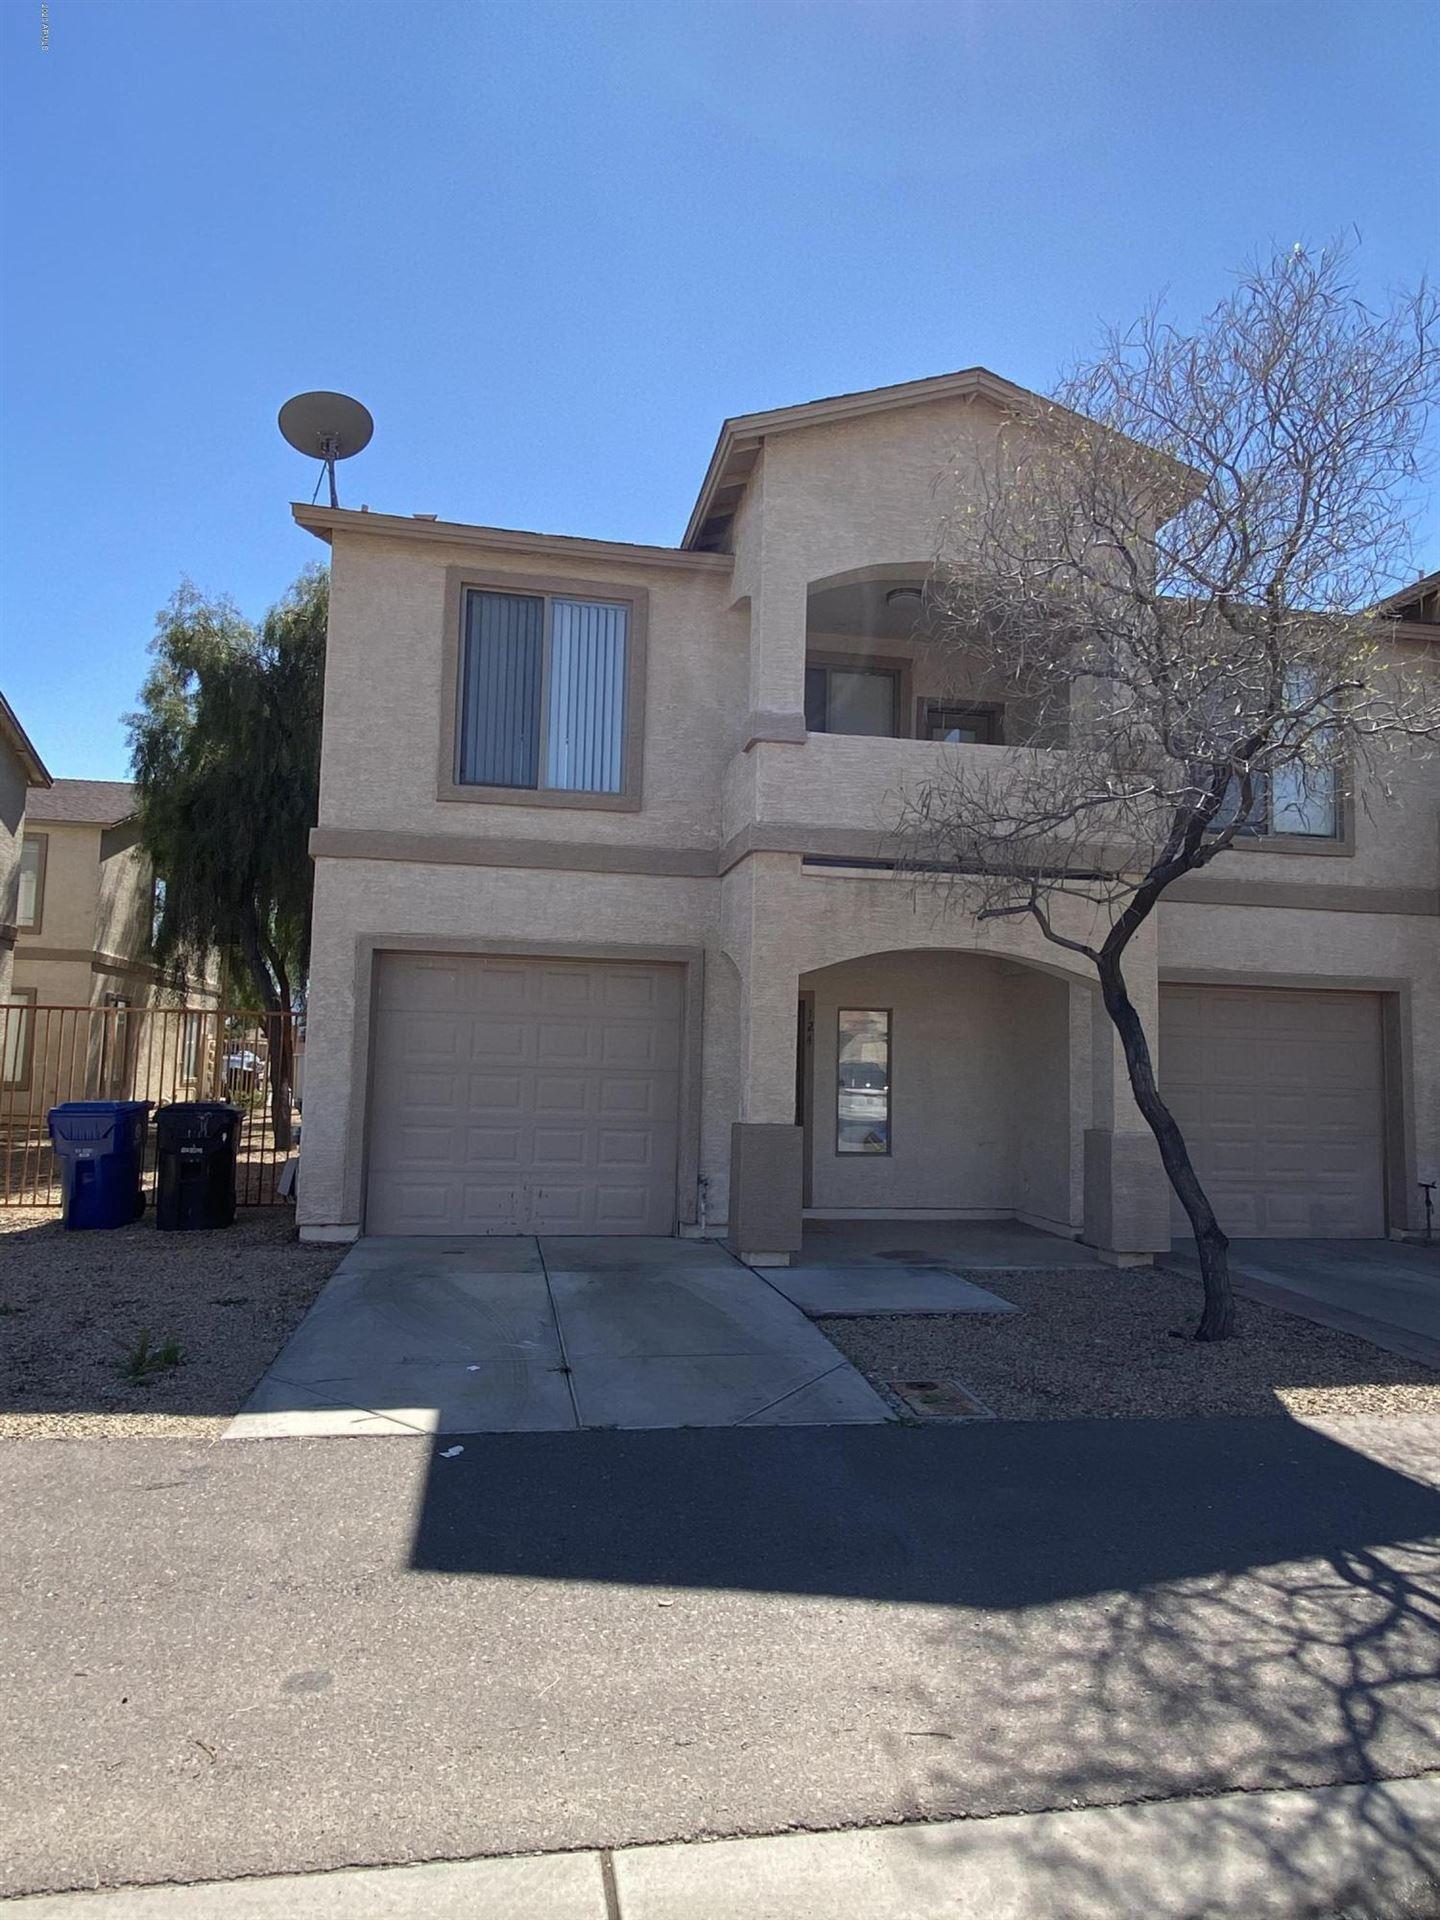 Photo of 206 E LAWRENCE Boulevard #124, Avondale, AZ 85323 (MLS # 6246418)